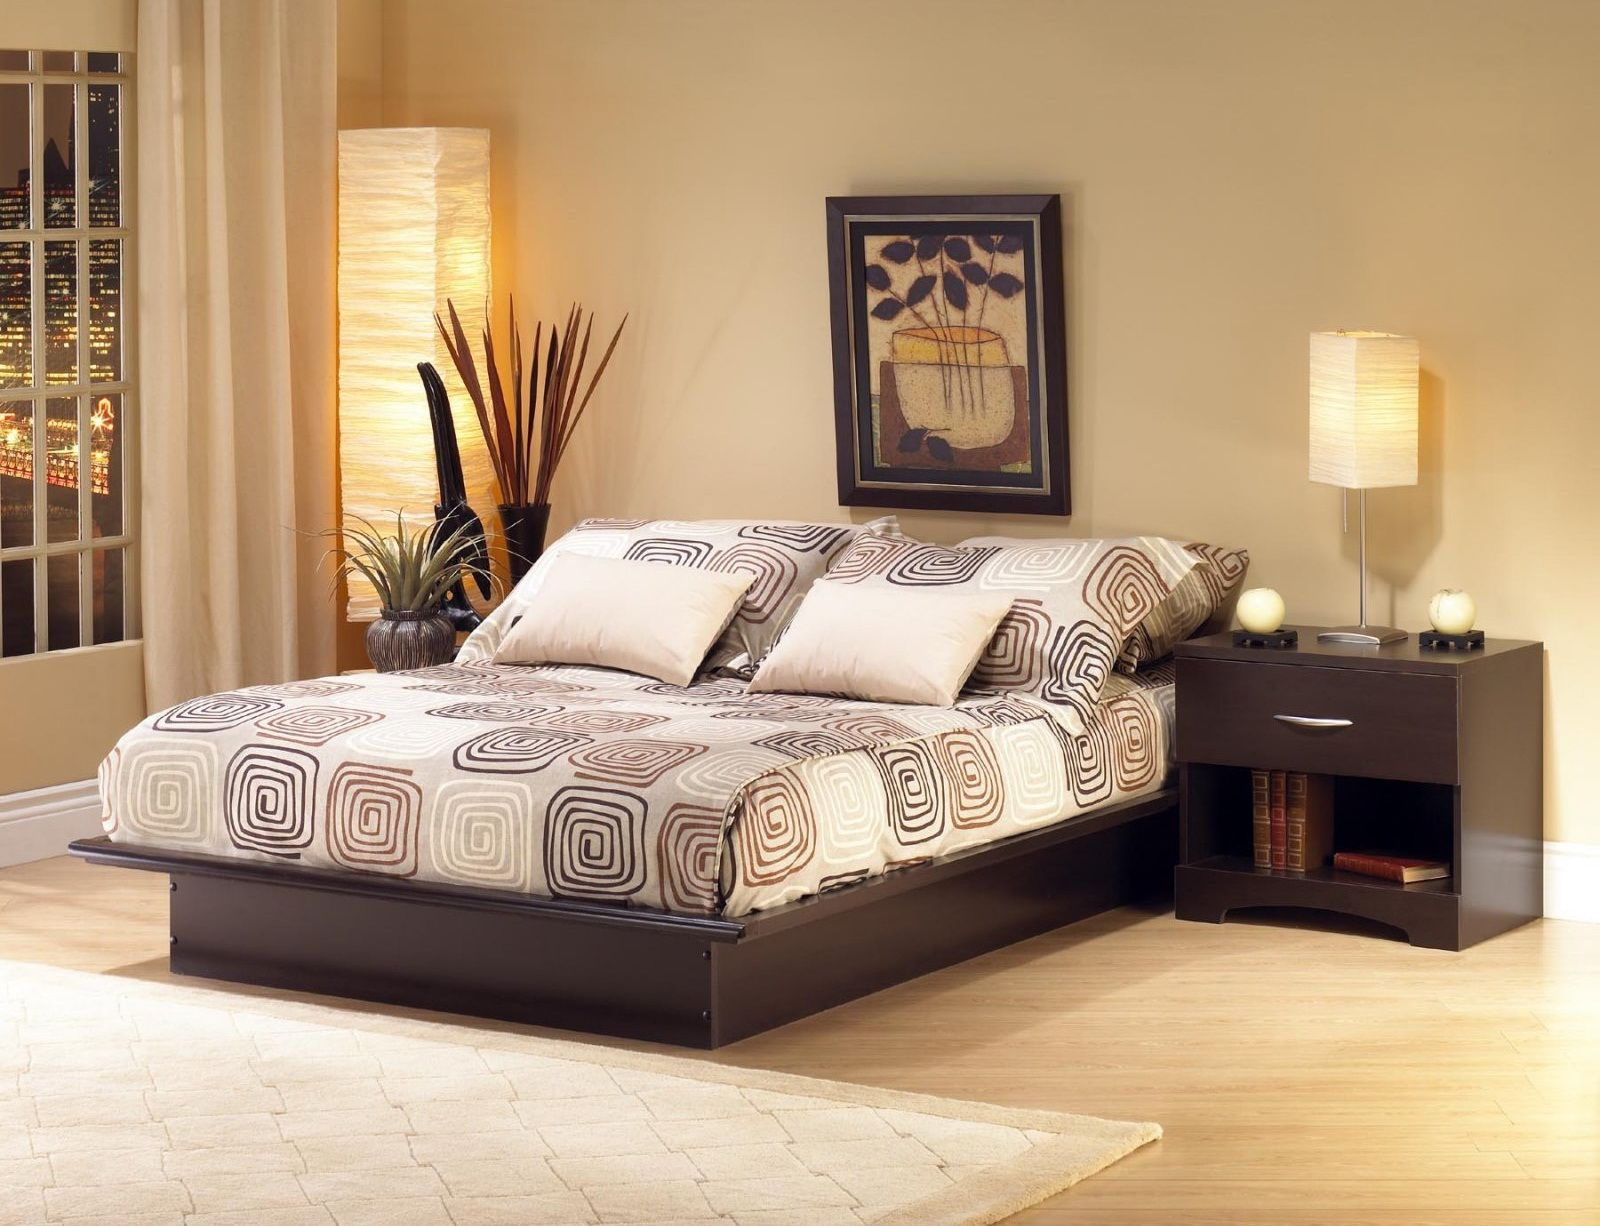 Simple Bedroom Redos Simple Bedroom Design Remodel Bedroom